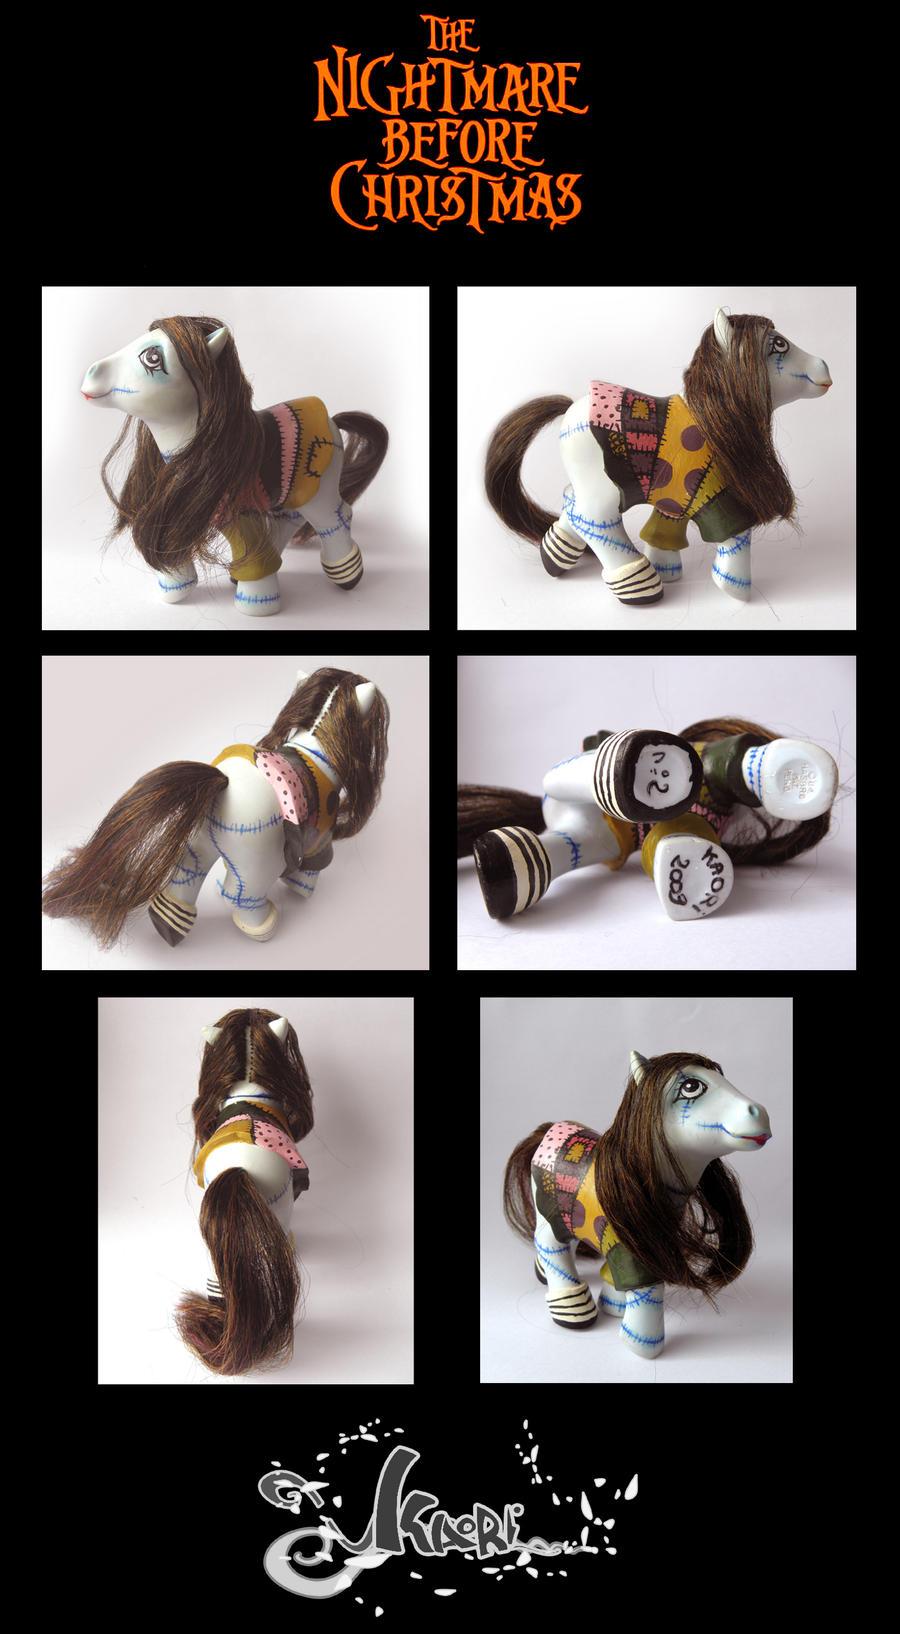 'MON PETIT PONEY' sujet général - Page 5 Sallu_My_little_pony_OOAK_by_K_a_o_r_i